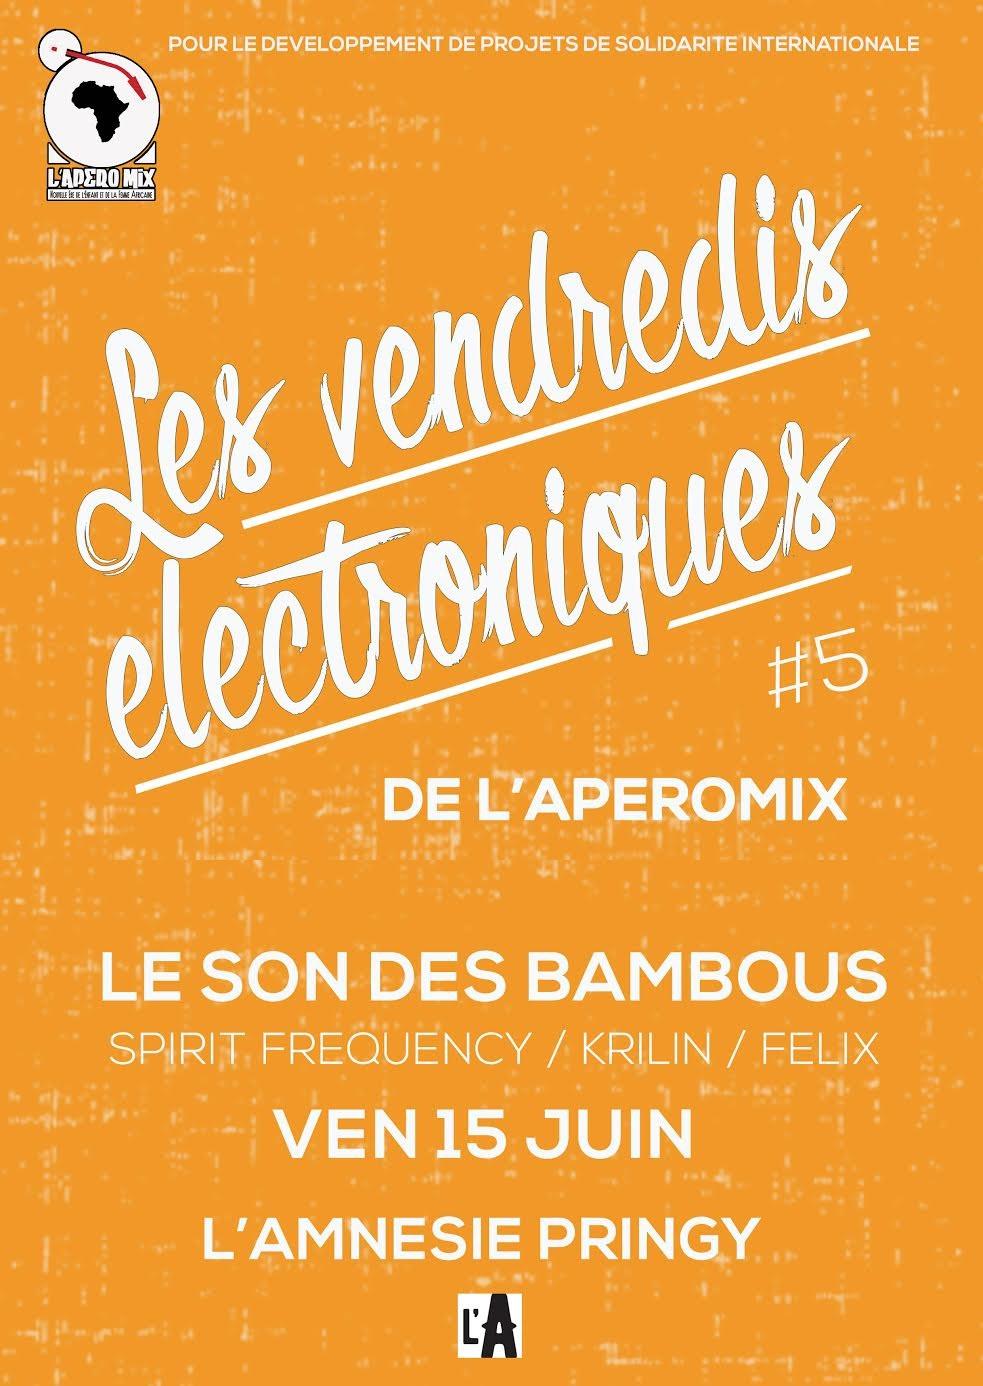 Vendredis Electroniques #5 - l'Amnésie